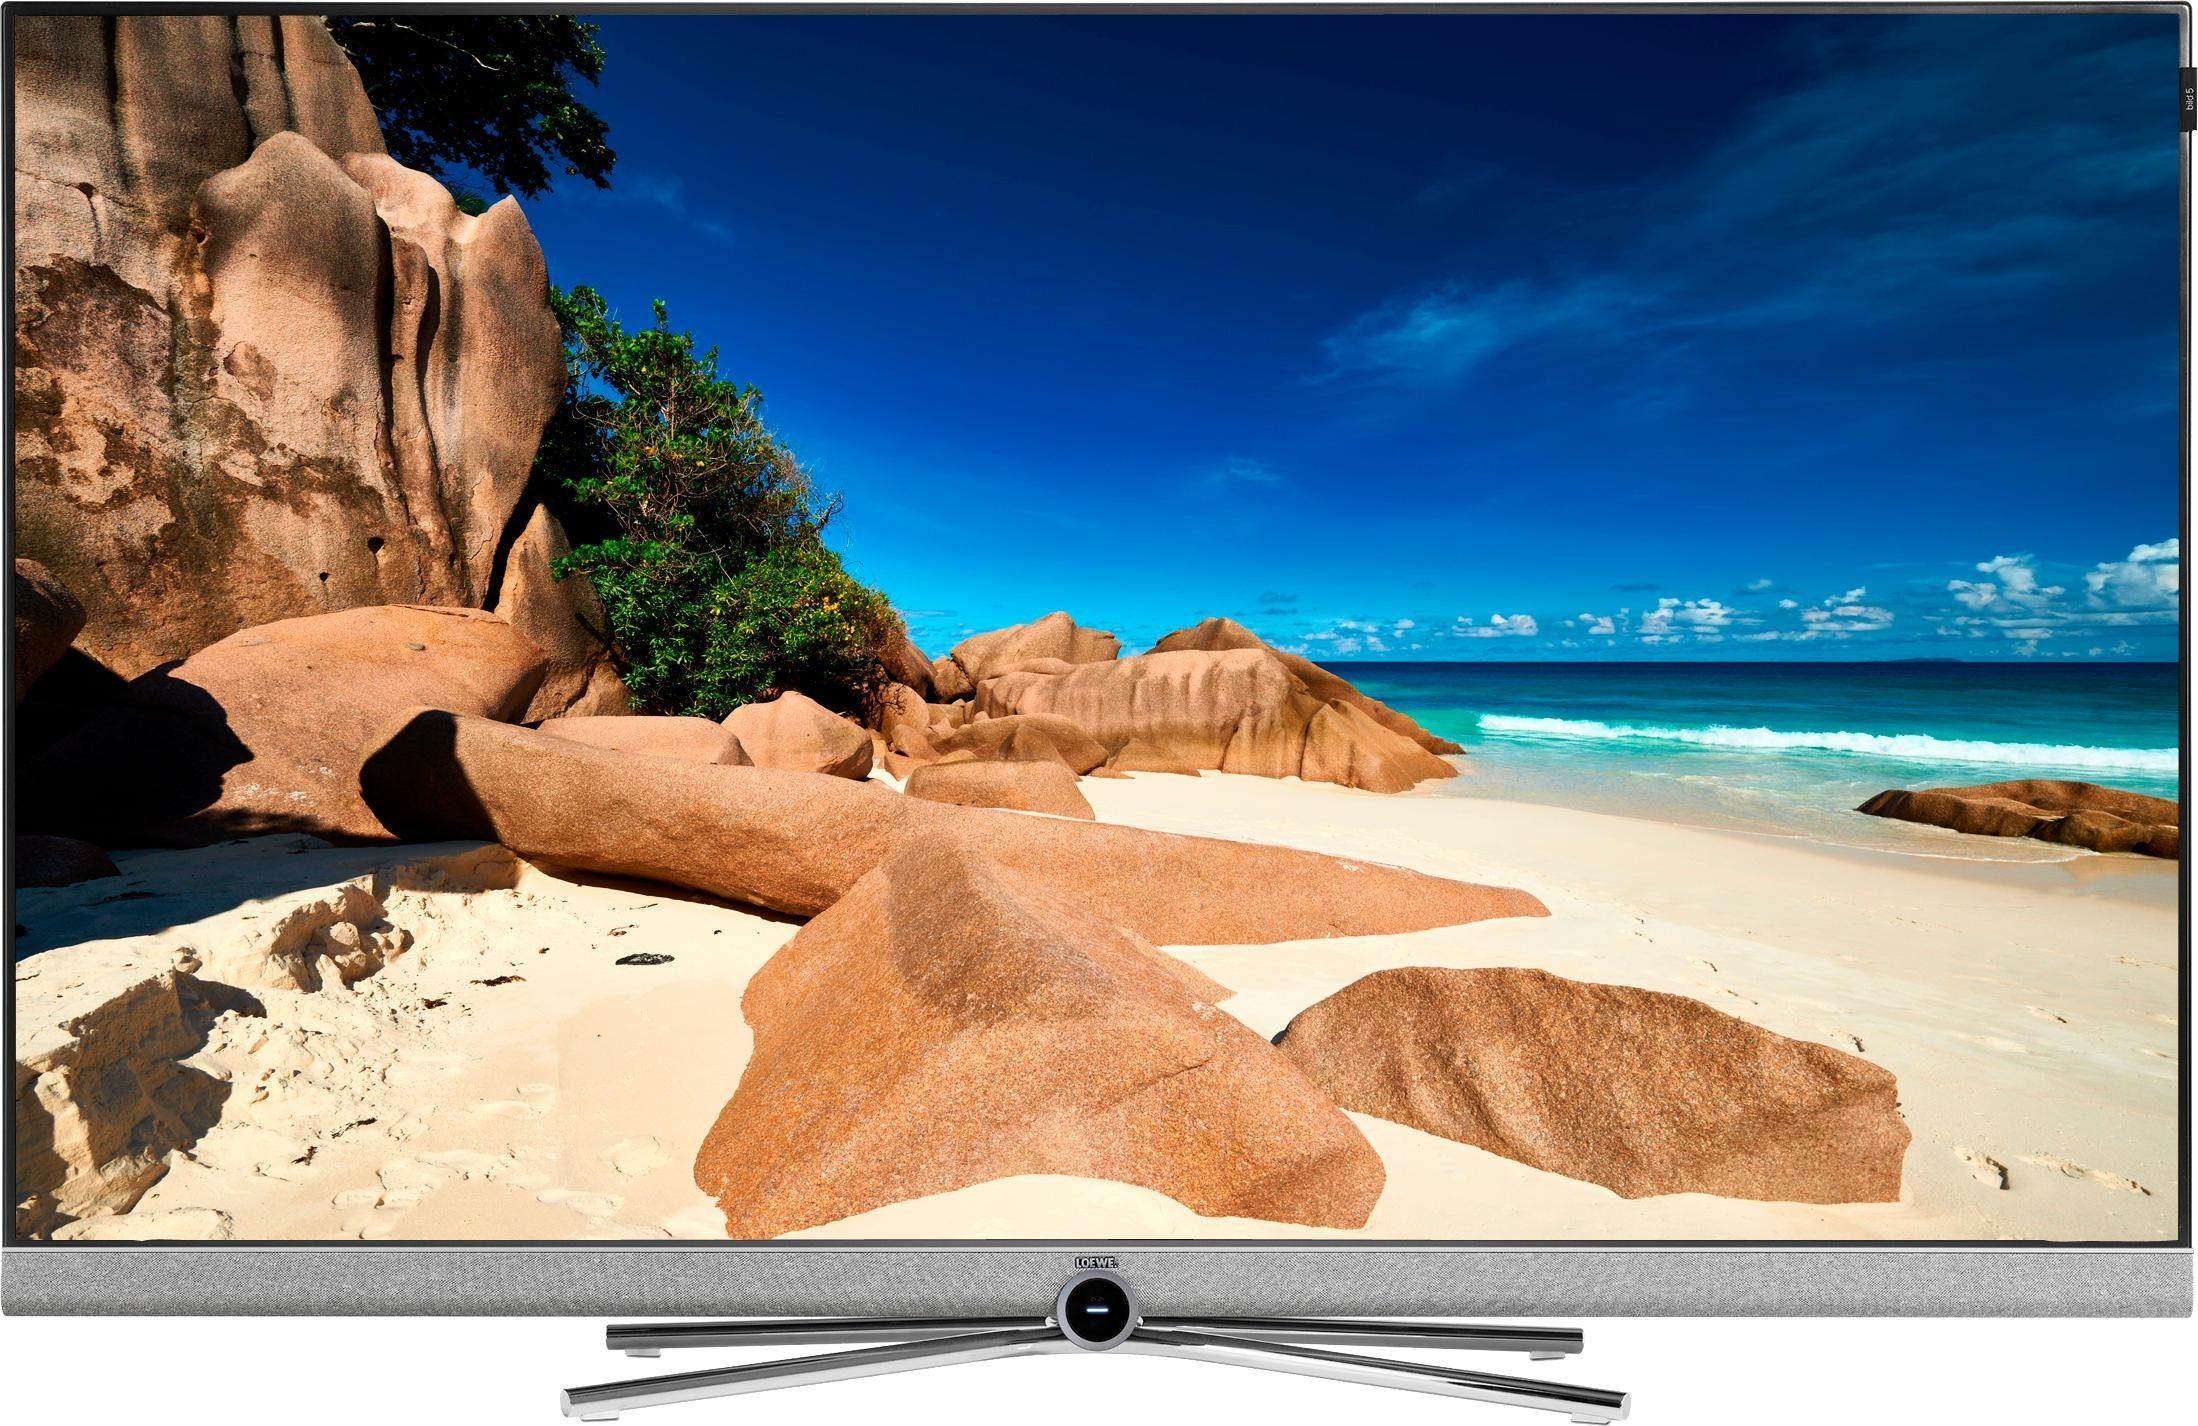 Loewe bild 5.48 LED-Fernseher (48 Zoll, 4K Ultra HD, Smart-TV, USB Archive)